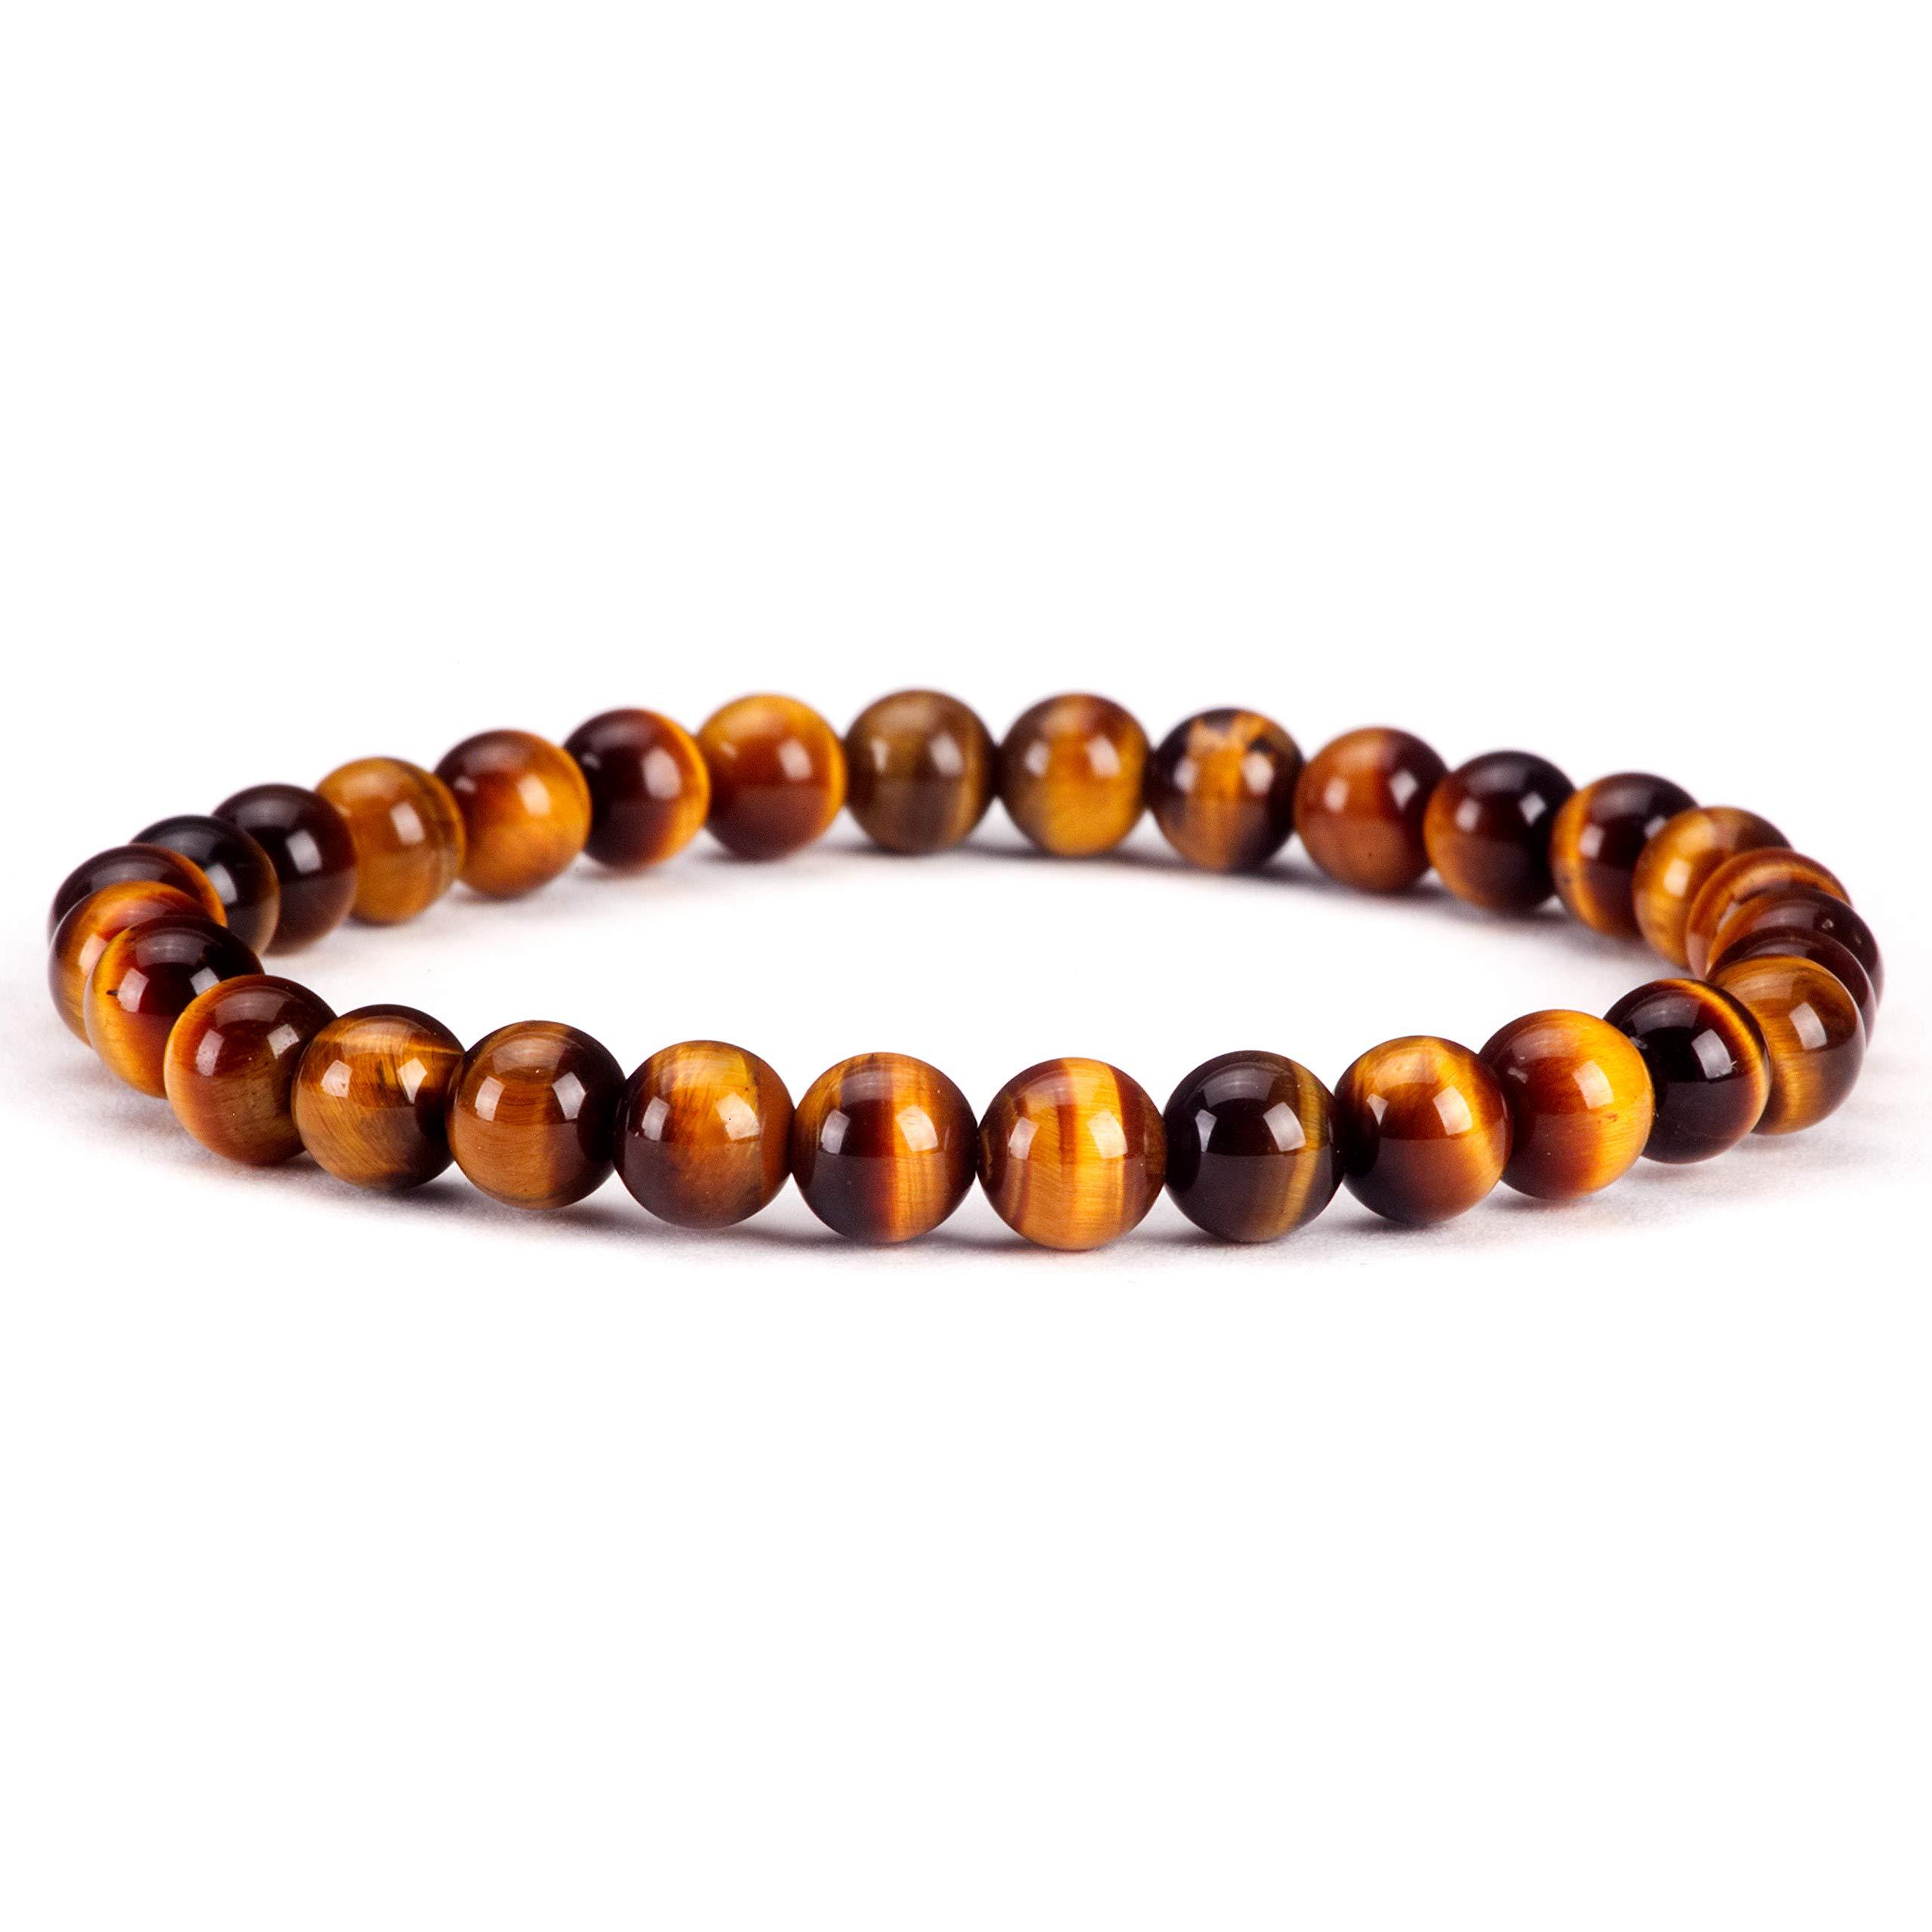 Cherry Tree Collection | Small, Medium, Large Sizes | Gemstone Beaded Stretch Bracelet | 6mm Round Beads